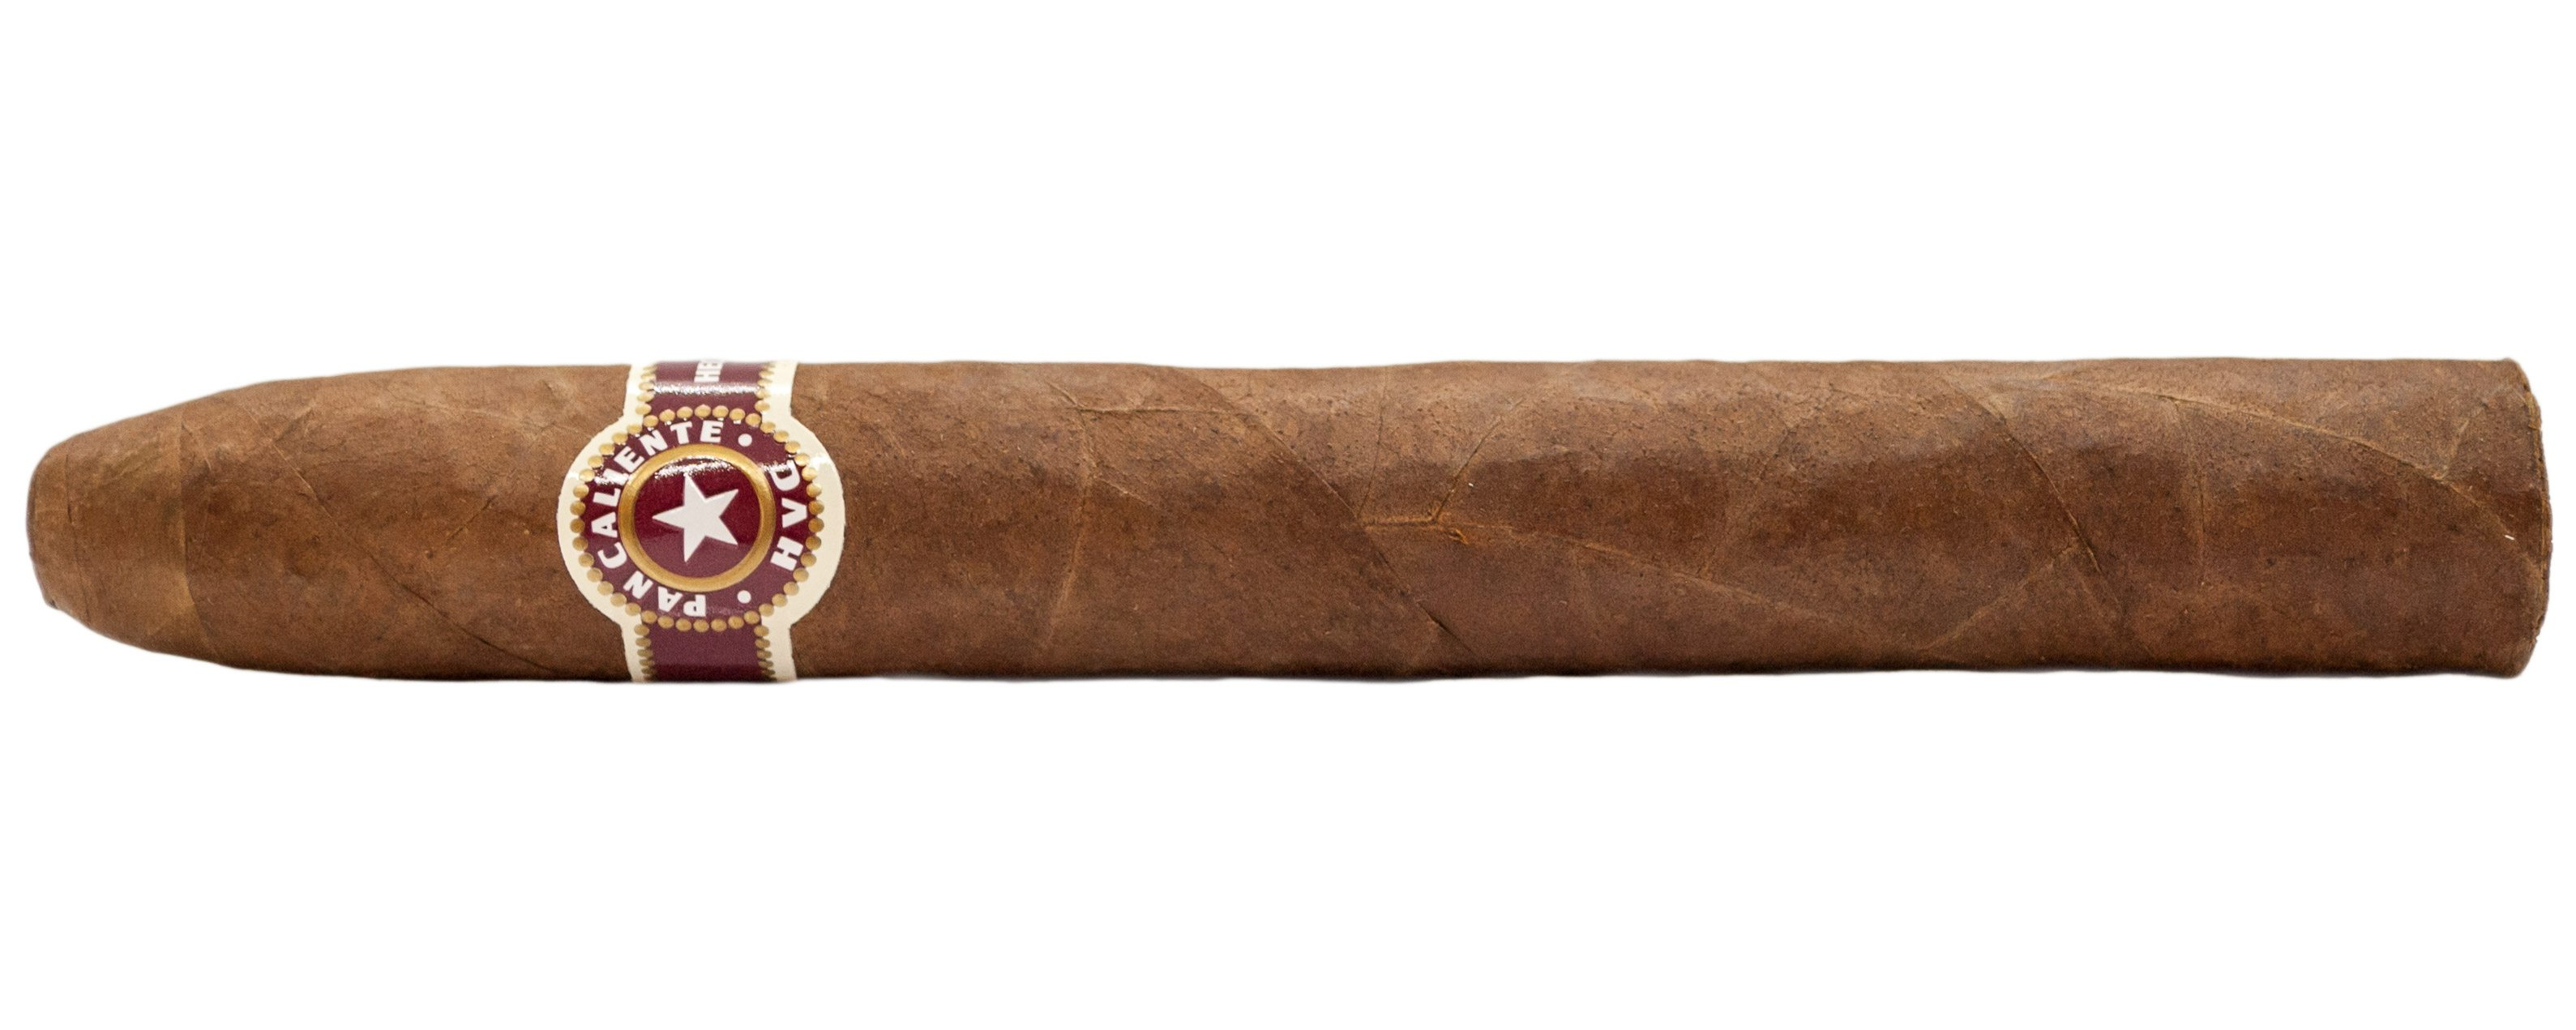 Blind Cigar Review: HVC | Pan Caliente Double Corona